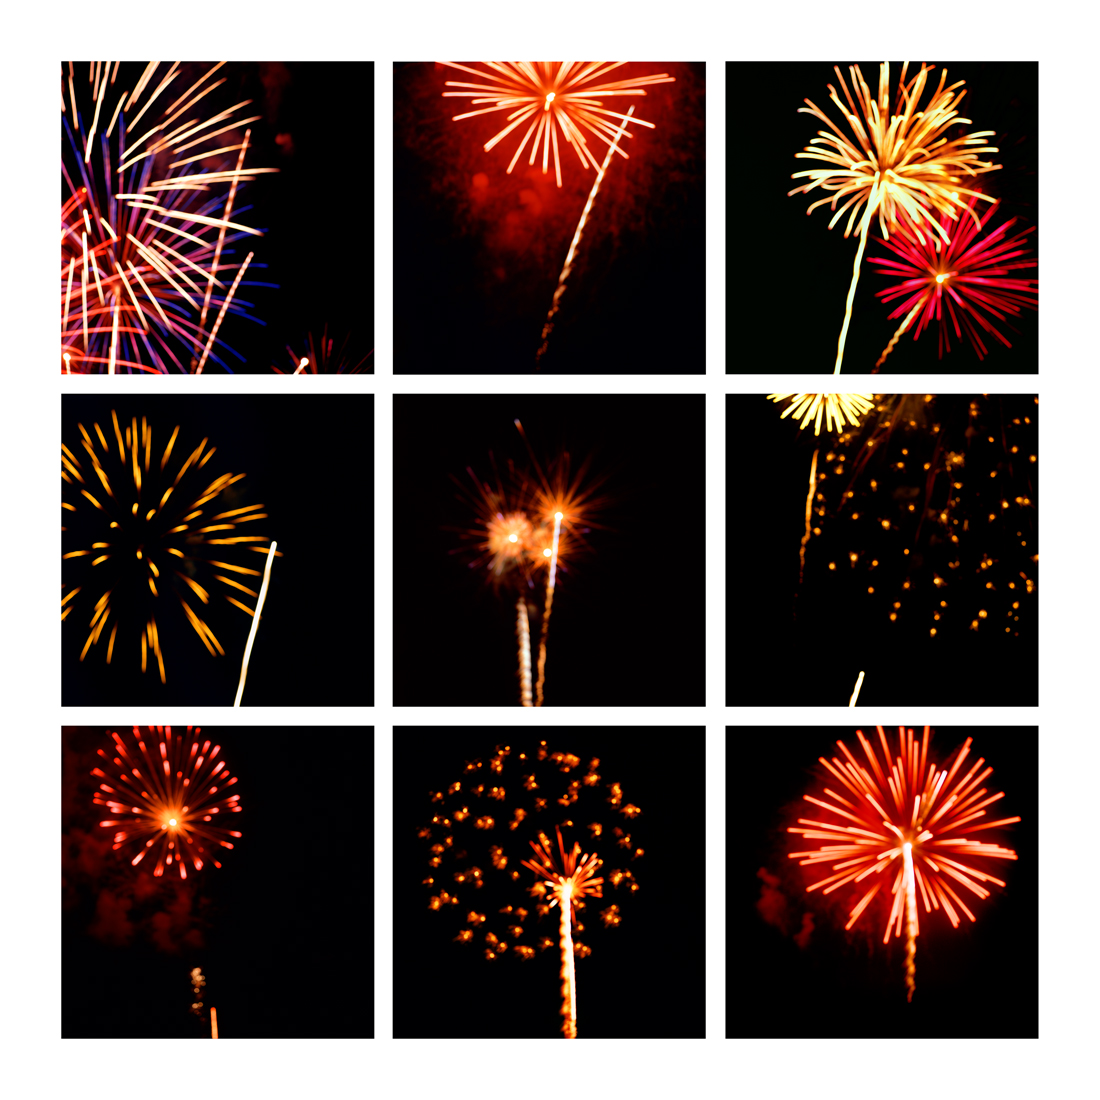 Fireworks #8, 2019 (2008-2019)